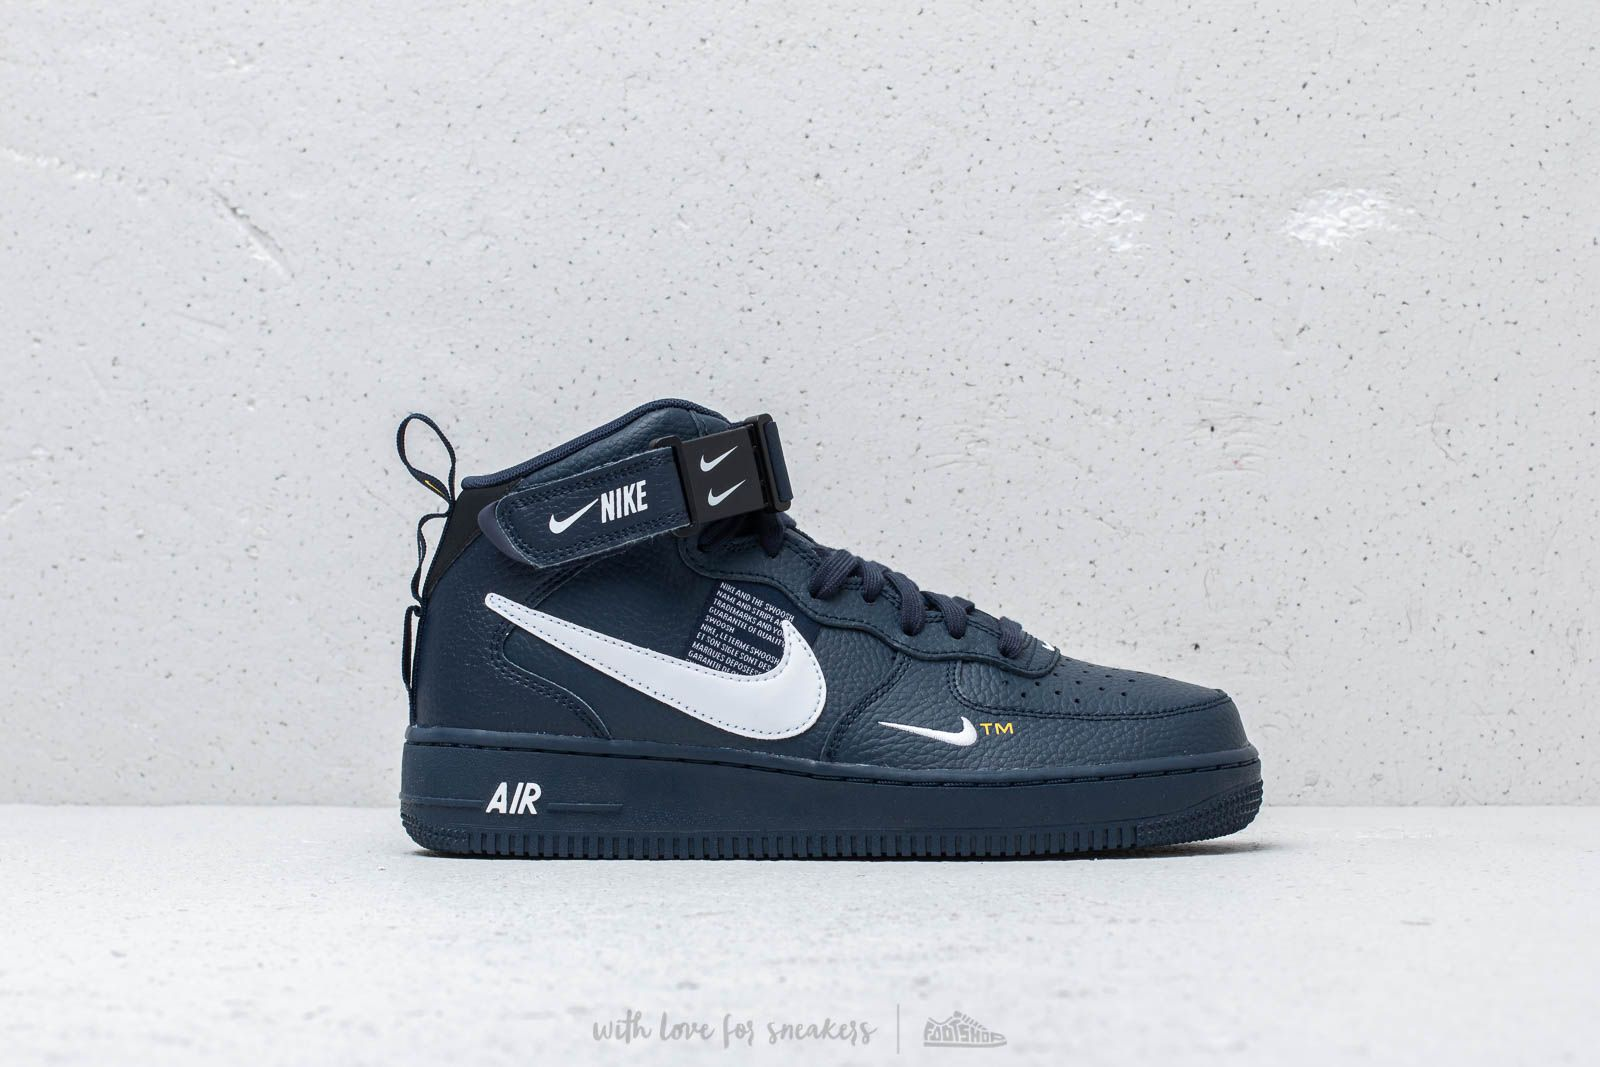 Nike Air Force 1 Mid '07 Lv8 Obsidian White Black | Footshop